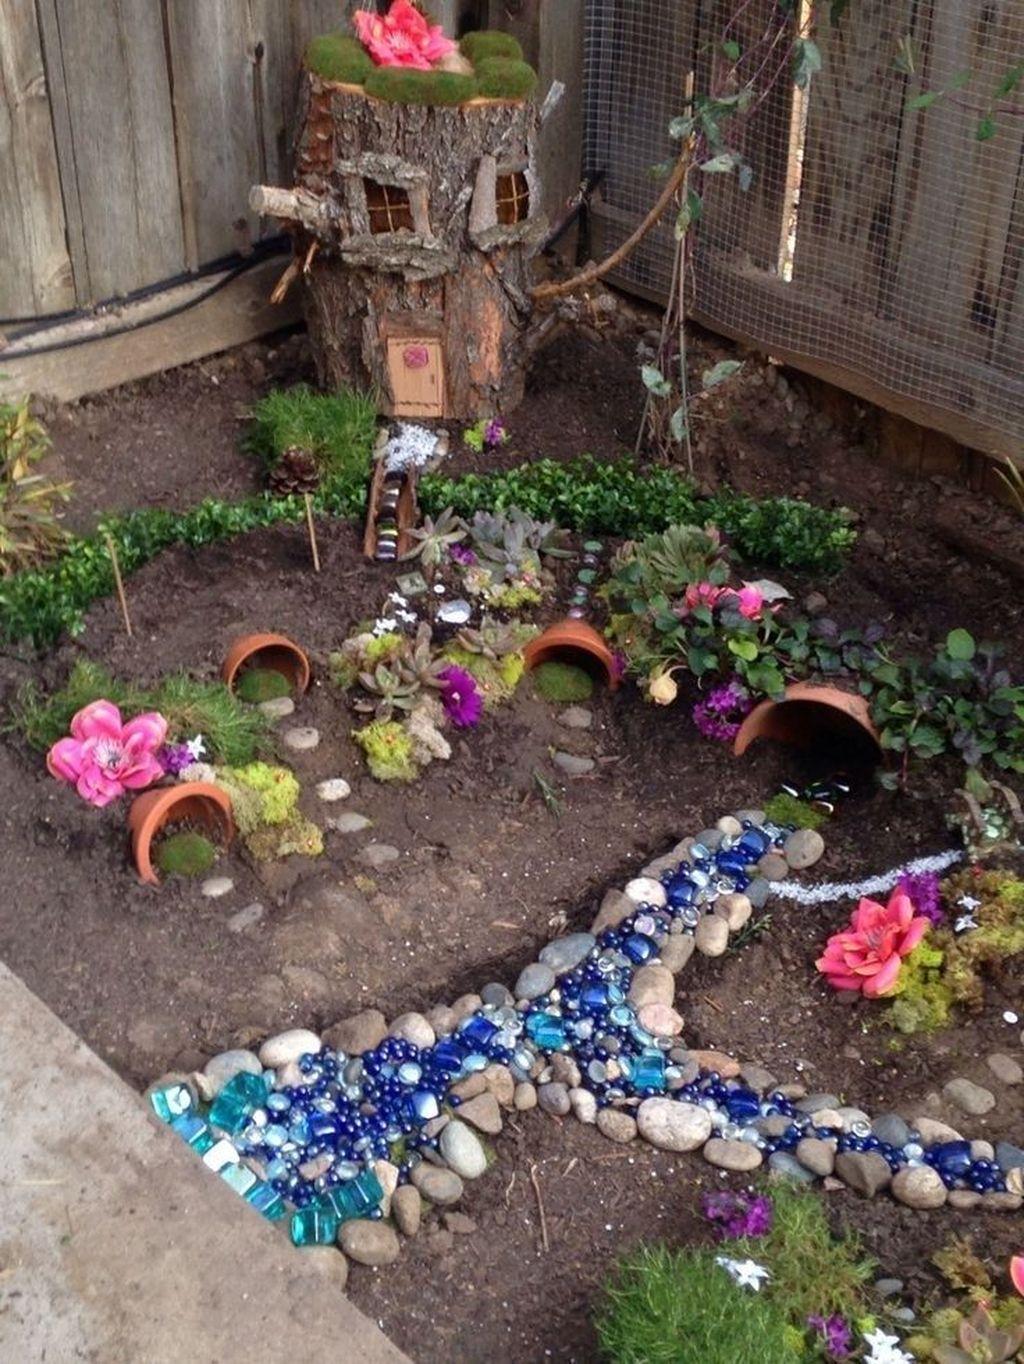 Unordinary Magical Fairy Garden Design Ideas To Try 16